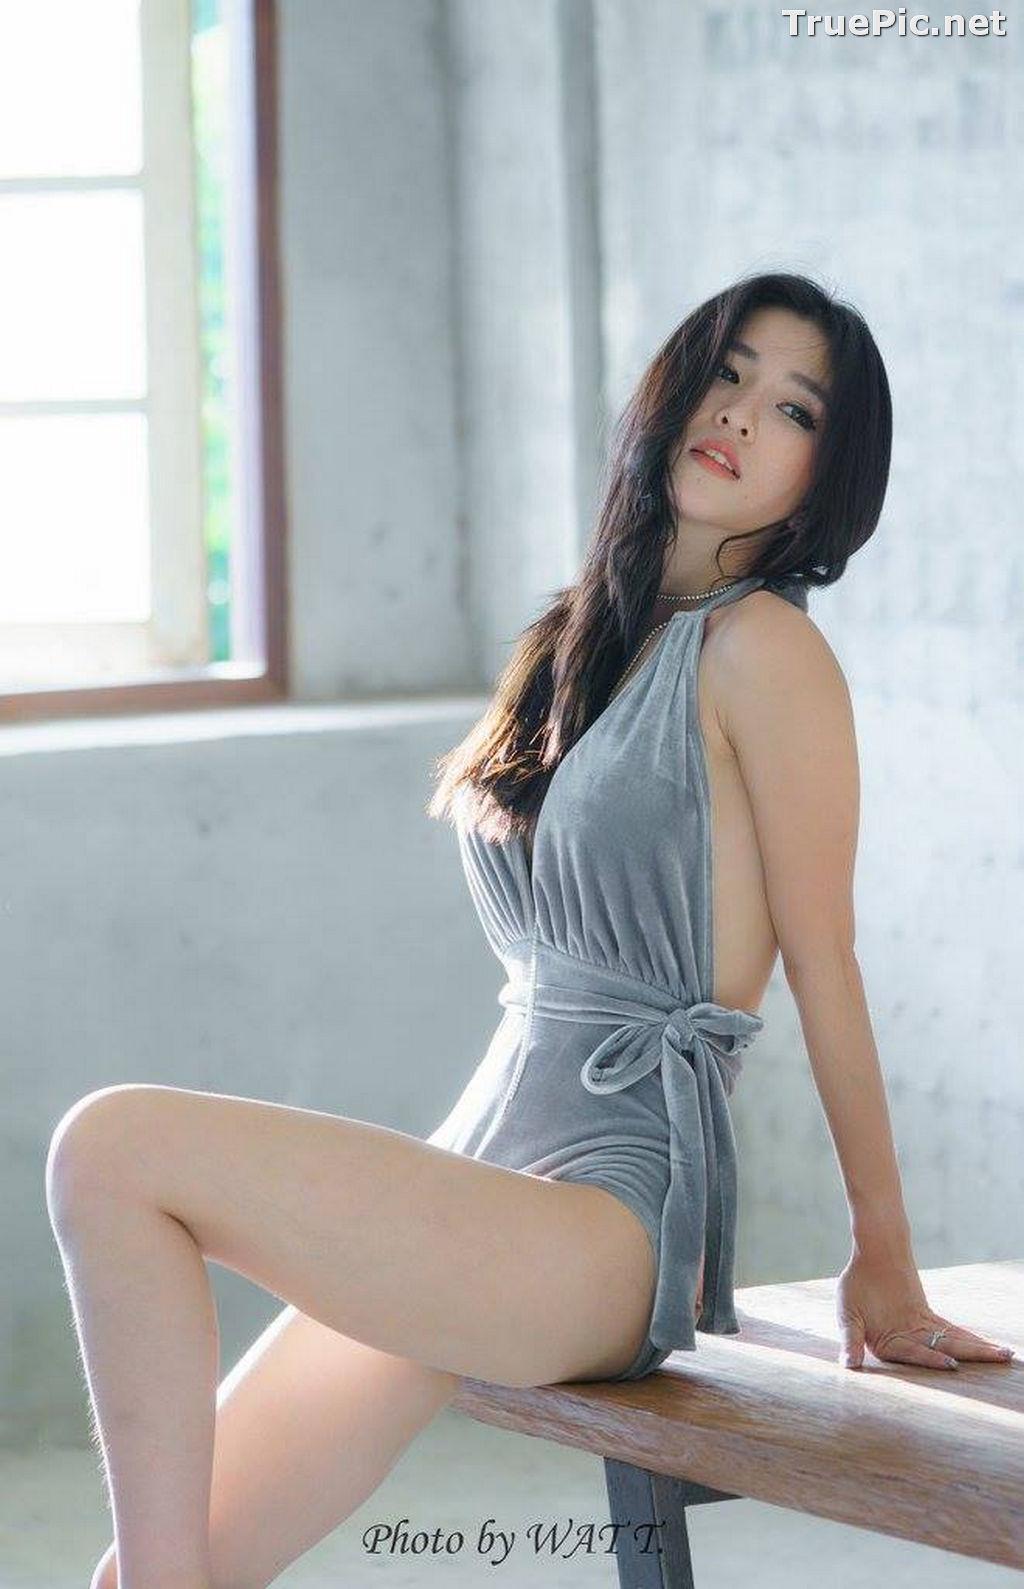 Image Thailand Model - Atita Wittayakajohndet - Oh! Shape of You - TruePic.net - Picture-9